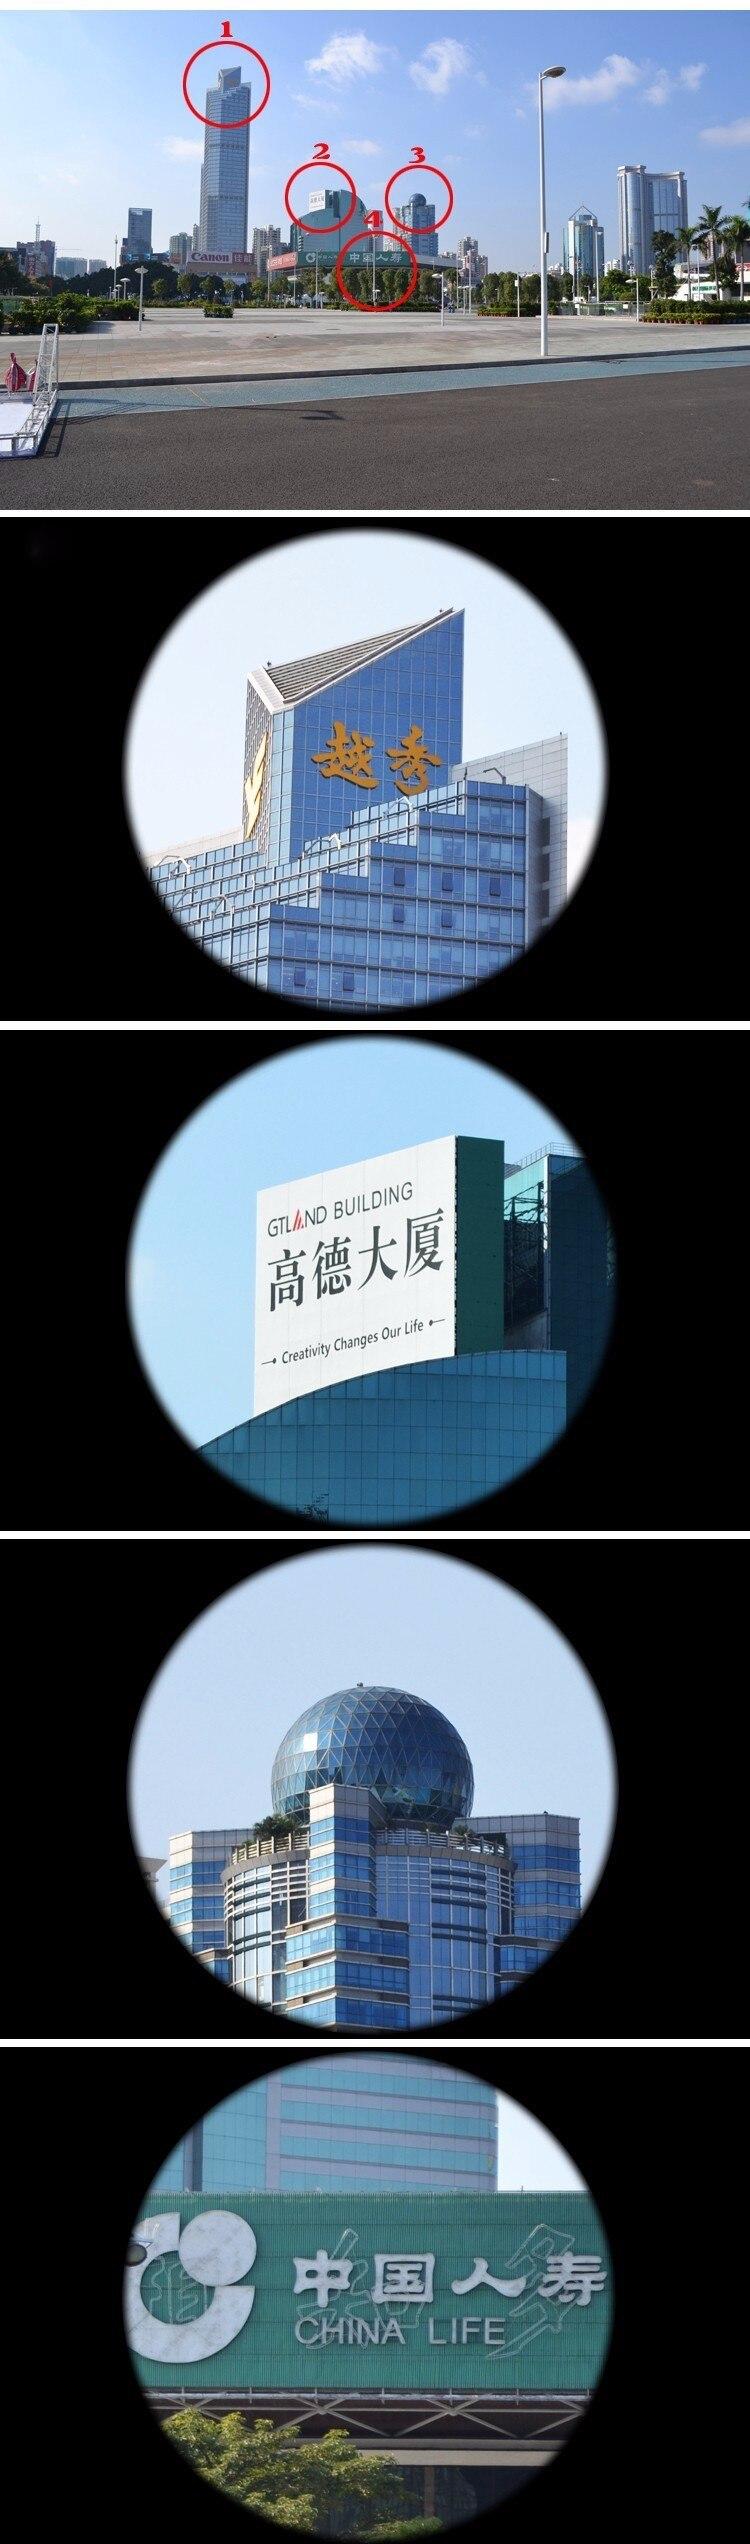 Newest Mobile Phone Camera Lens Kits Fisheye lense Wide Angle Macro Lens 12X Zoom Camera Telephoto Lens For iPhone Samsung LG 14